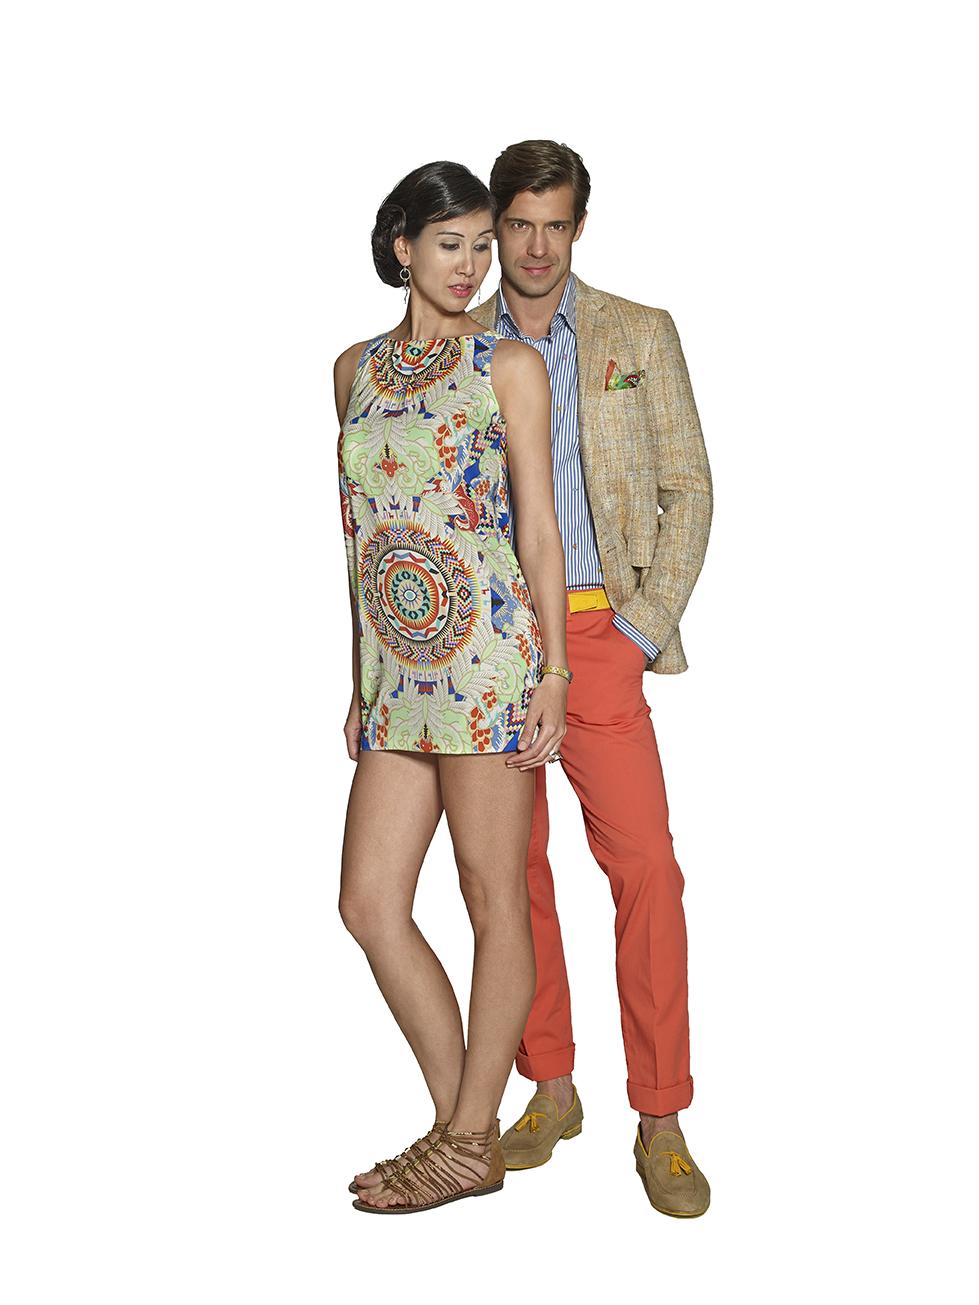 M Penner Studio Fashion Photo